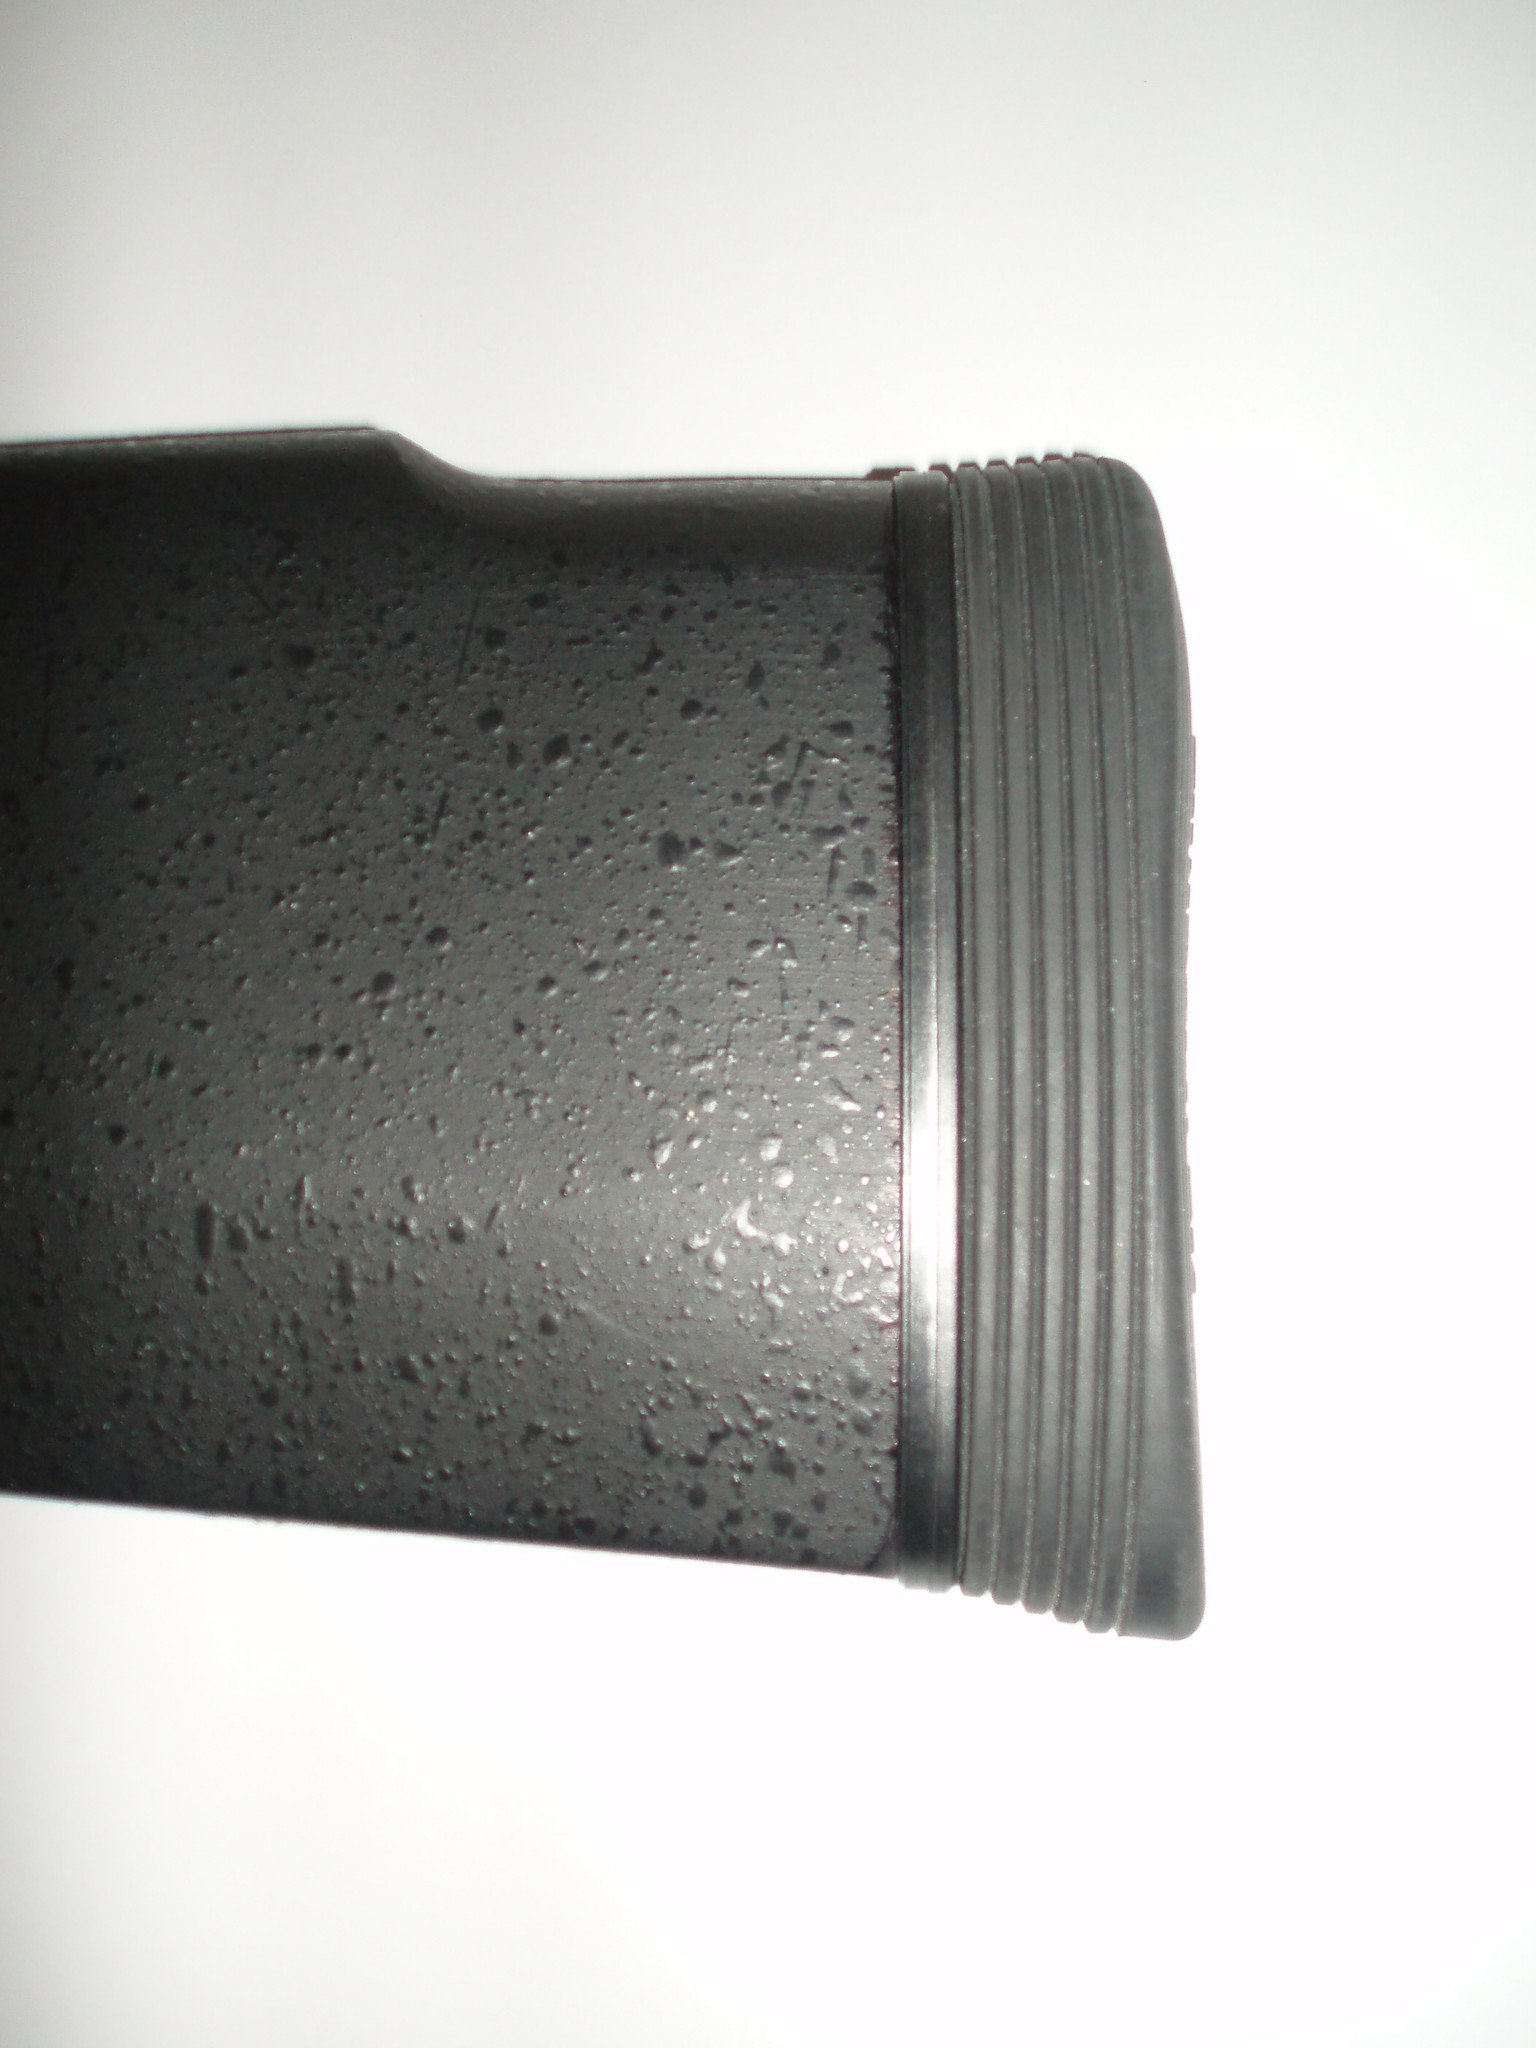 Limbsaver Classic Precision Fit Recoil Pad - Australian Tactical Precision